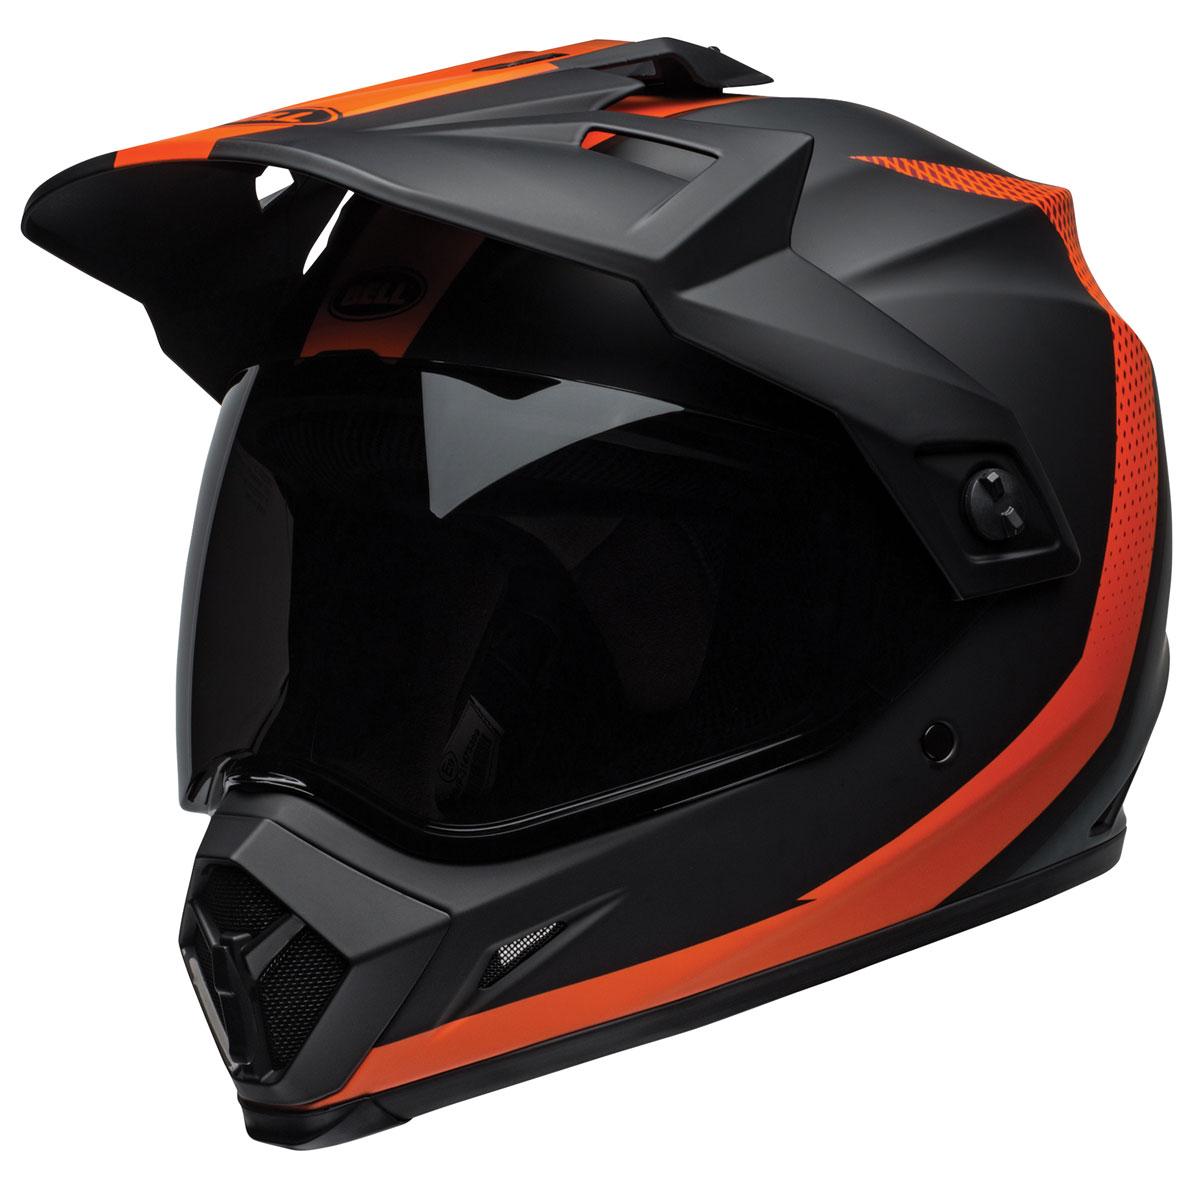 Bellr MX-9 Adventure MIPS Switchback Black/Orange Dual Sport Helmet